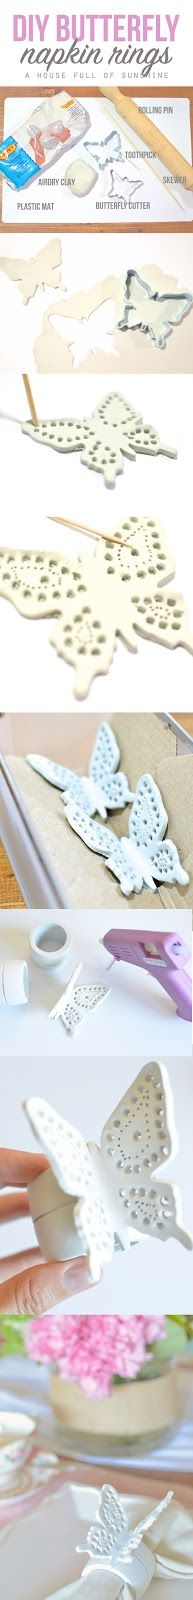 Easy DIY filigree butterfly napkin rings